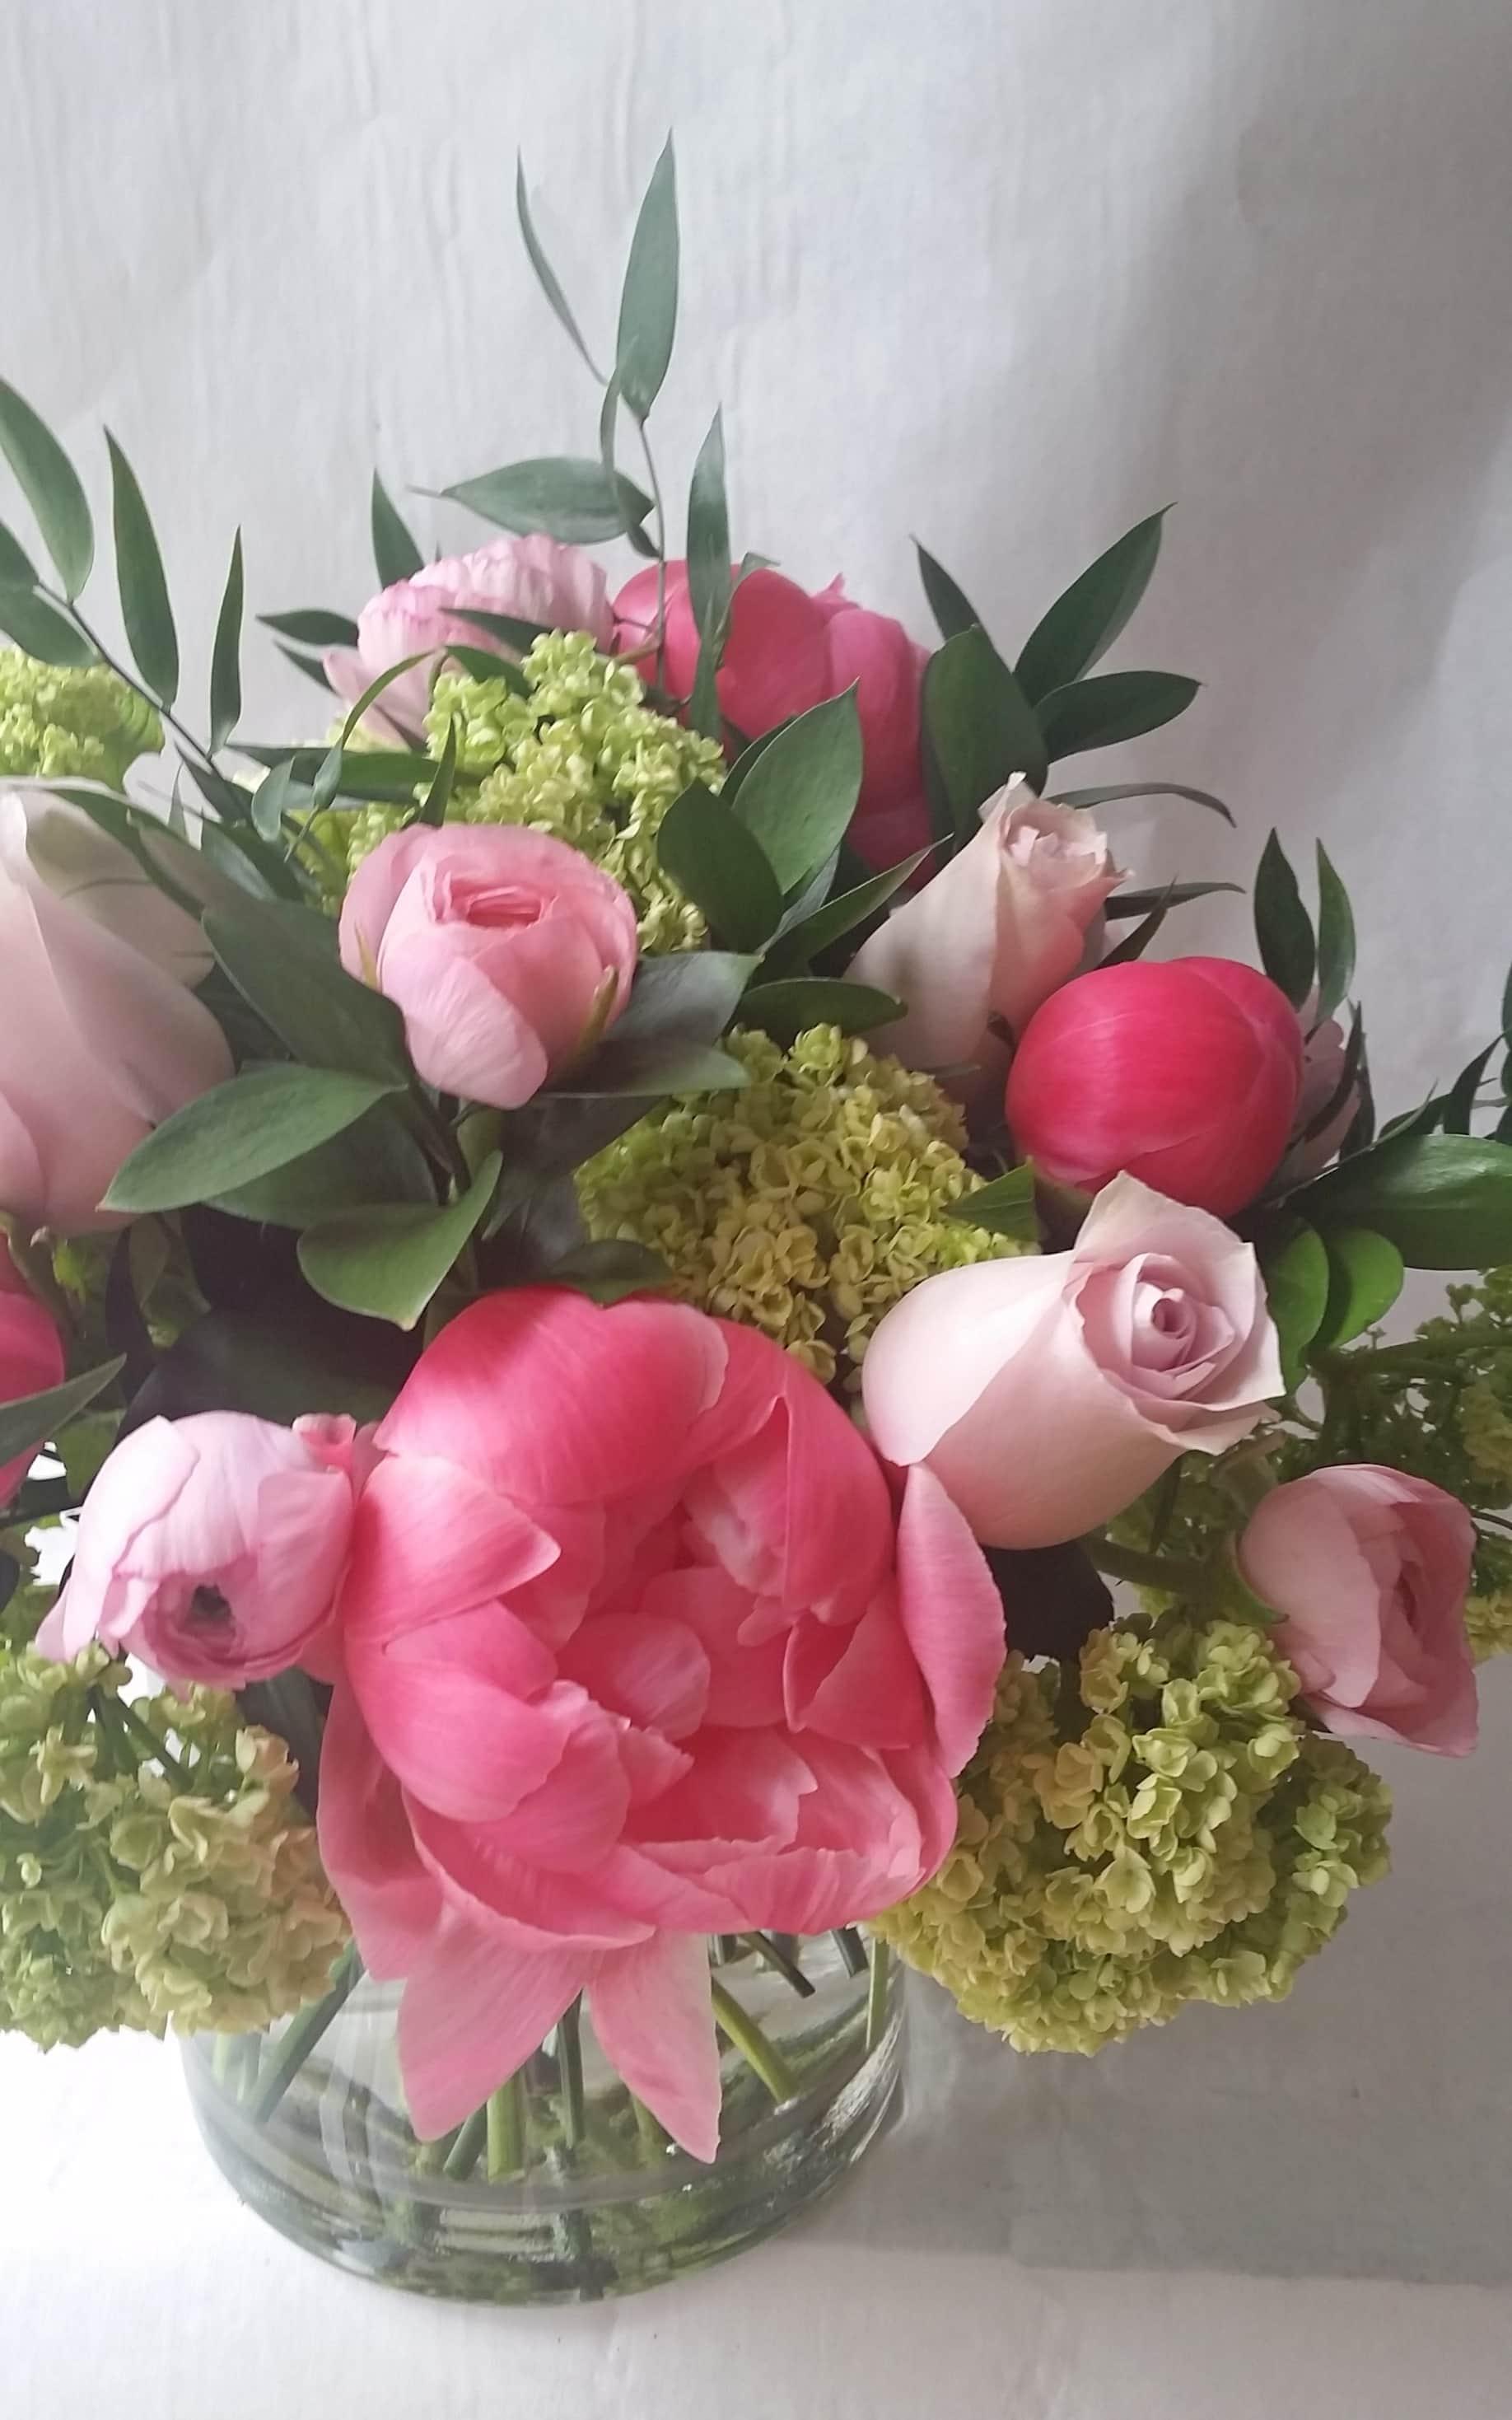 Marguerite Strawberry Fields Flowers Finds